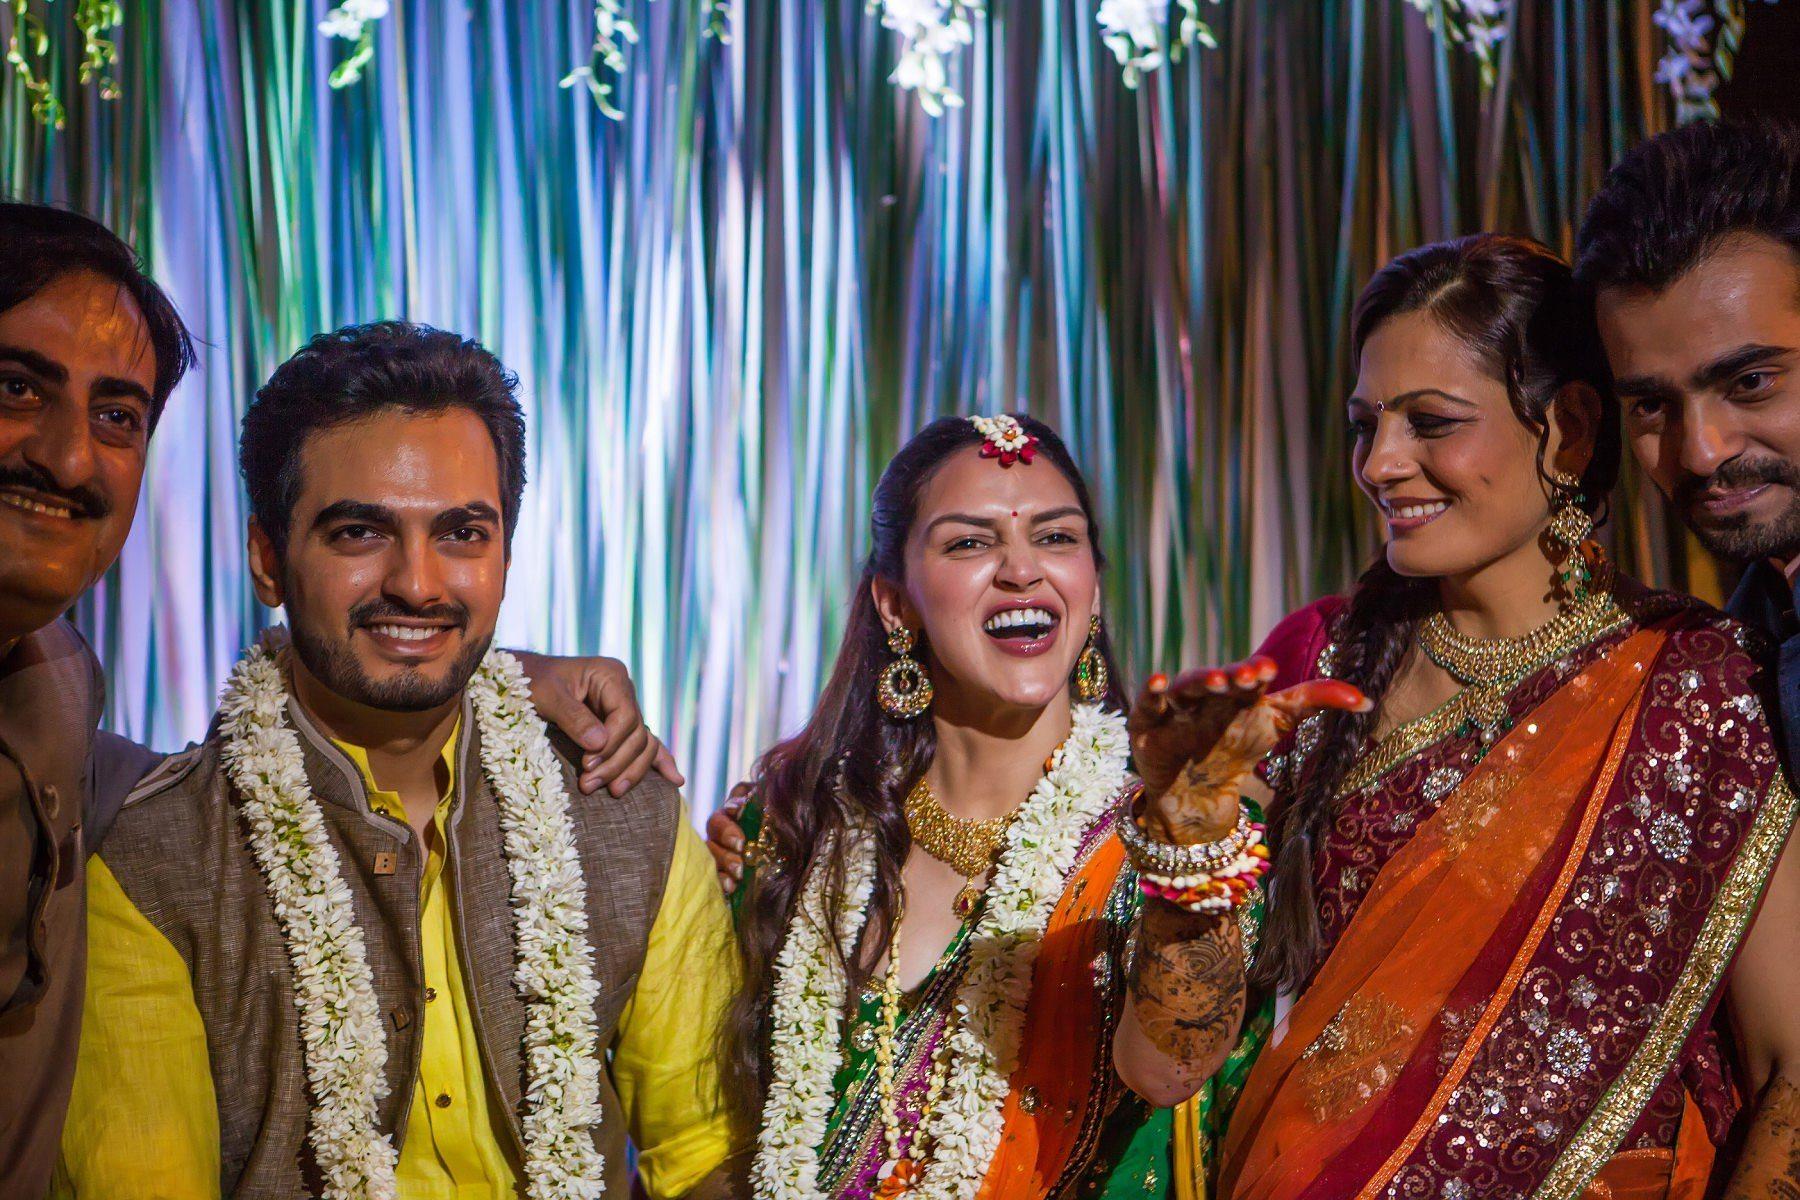 Esha Deol Bharat Takhtani Henna Party Mumbai